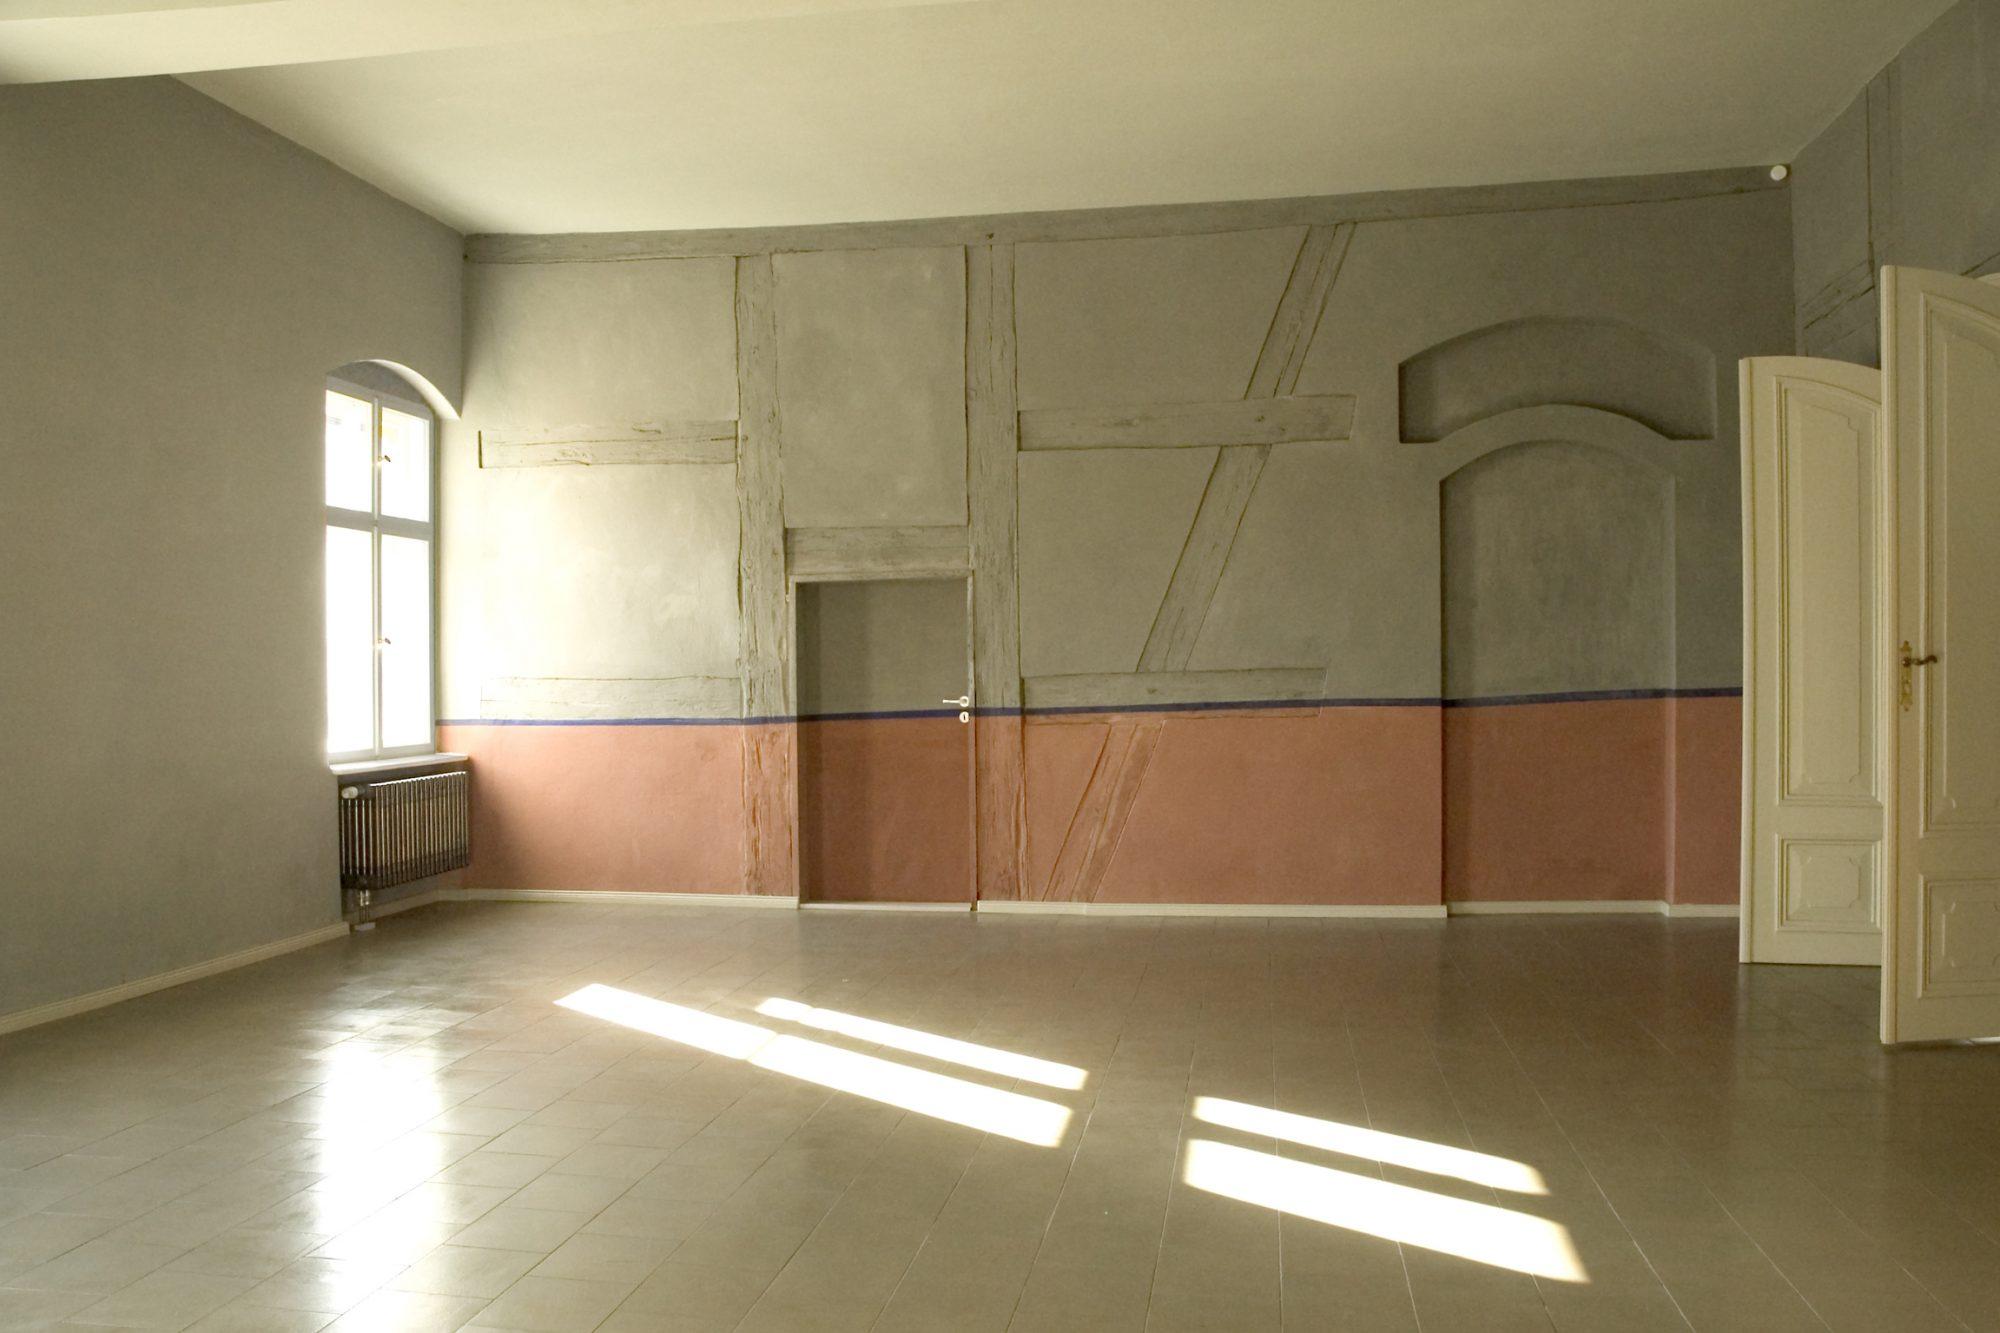 ehem. Küche, Innenwand 1687